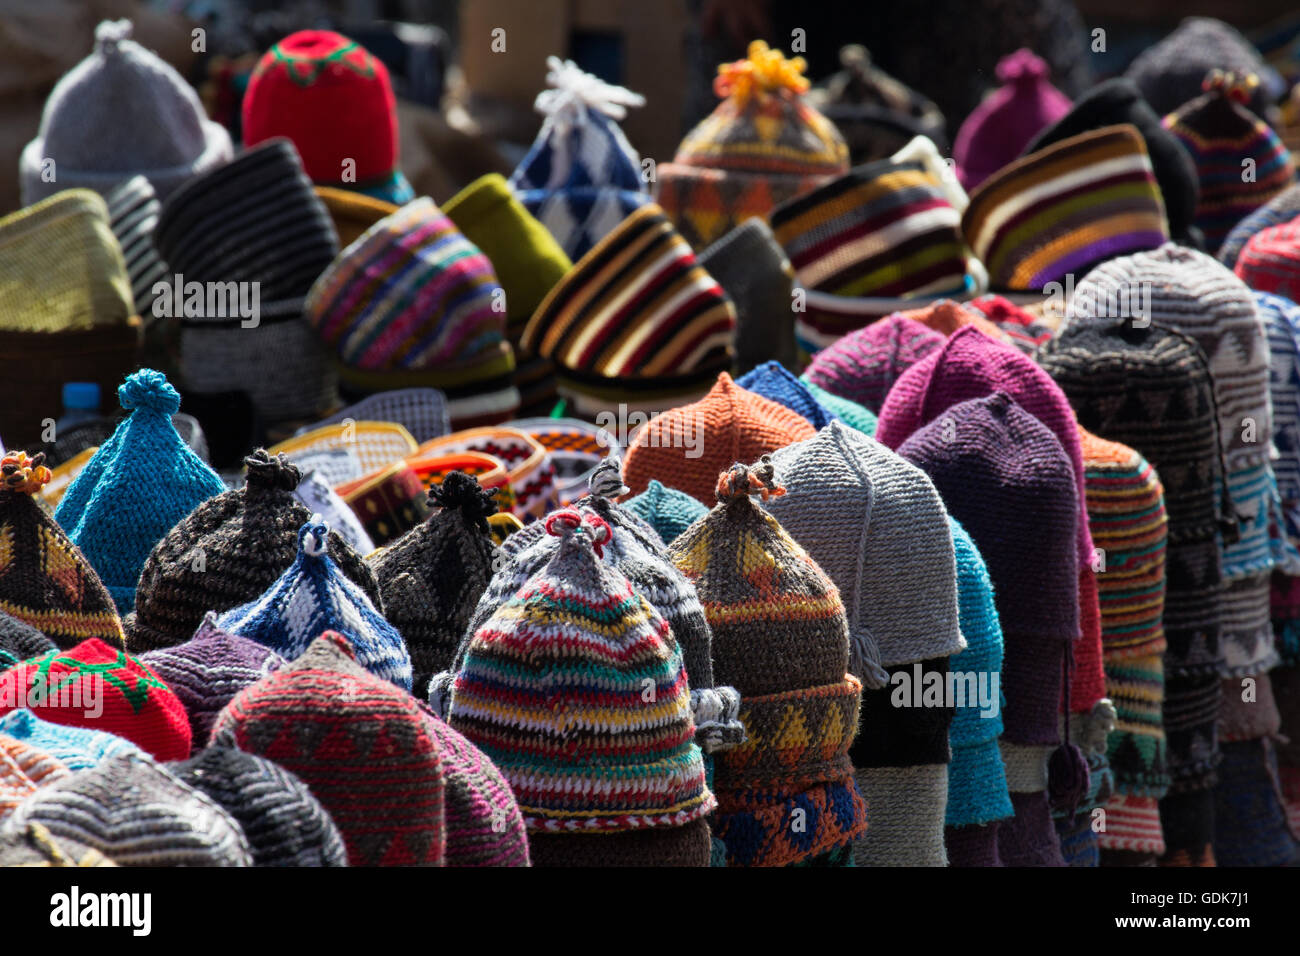 hats marrakech souk stockfotos hats marrakech souk. Black Bedroom Furniture Sets. Home Design Ideas